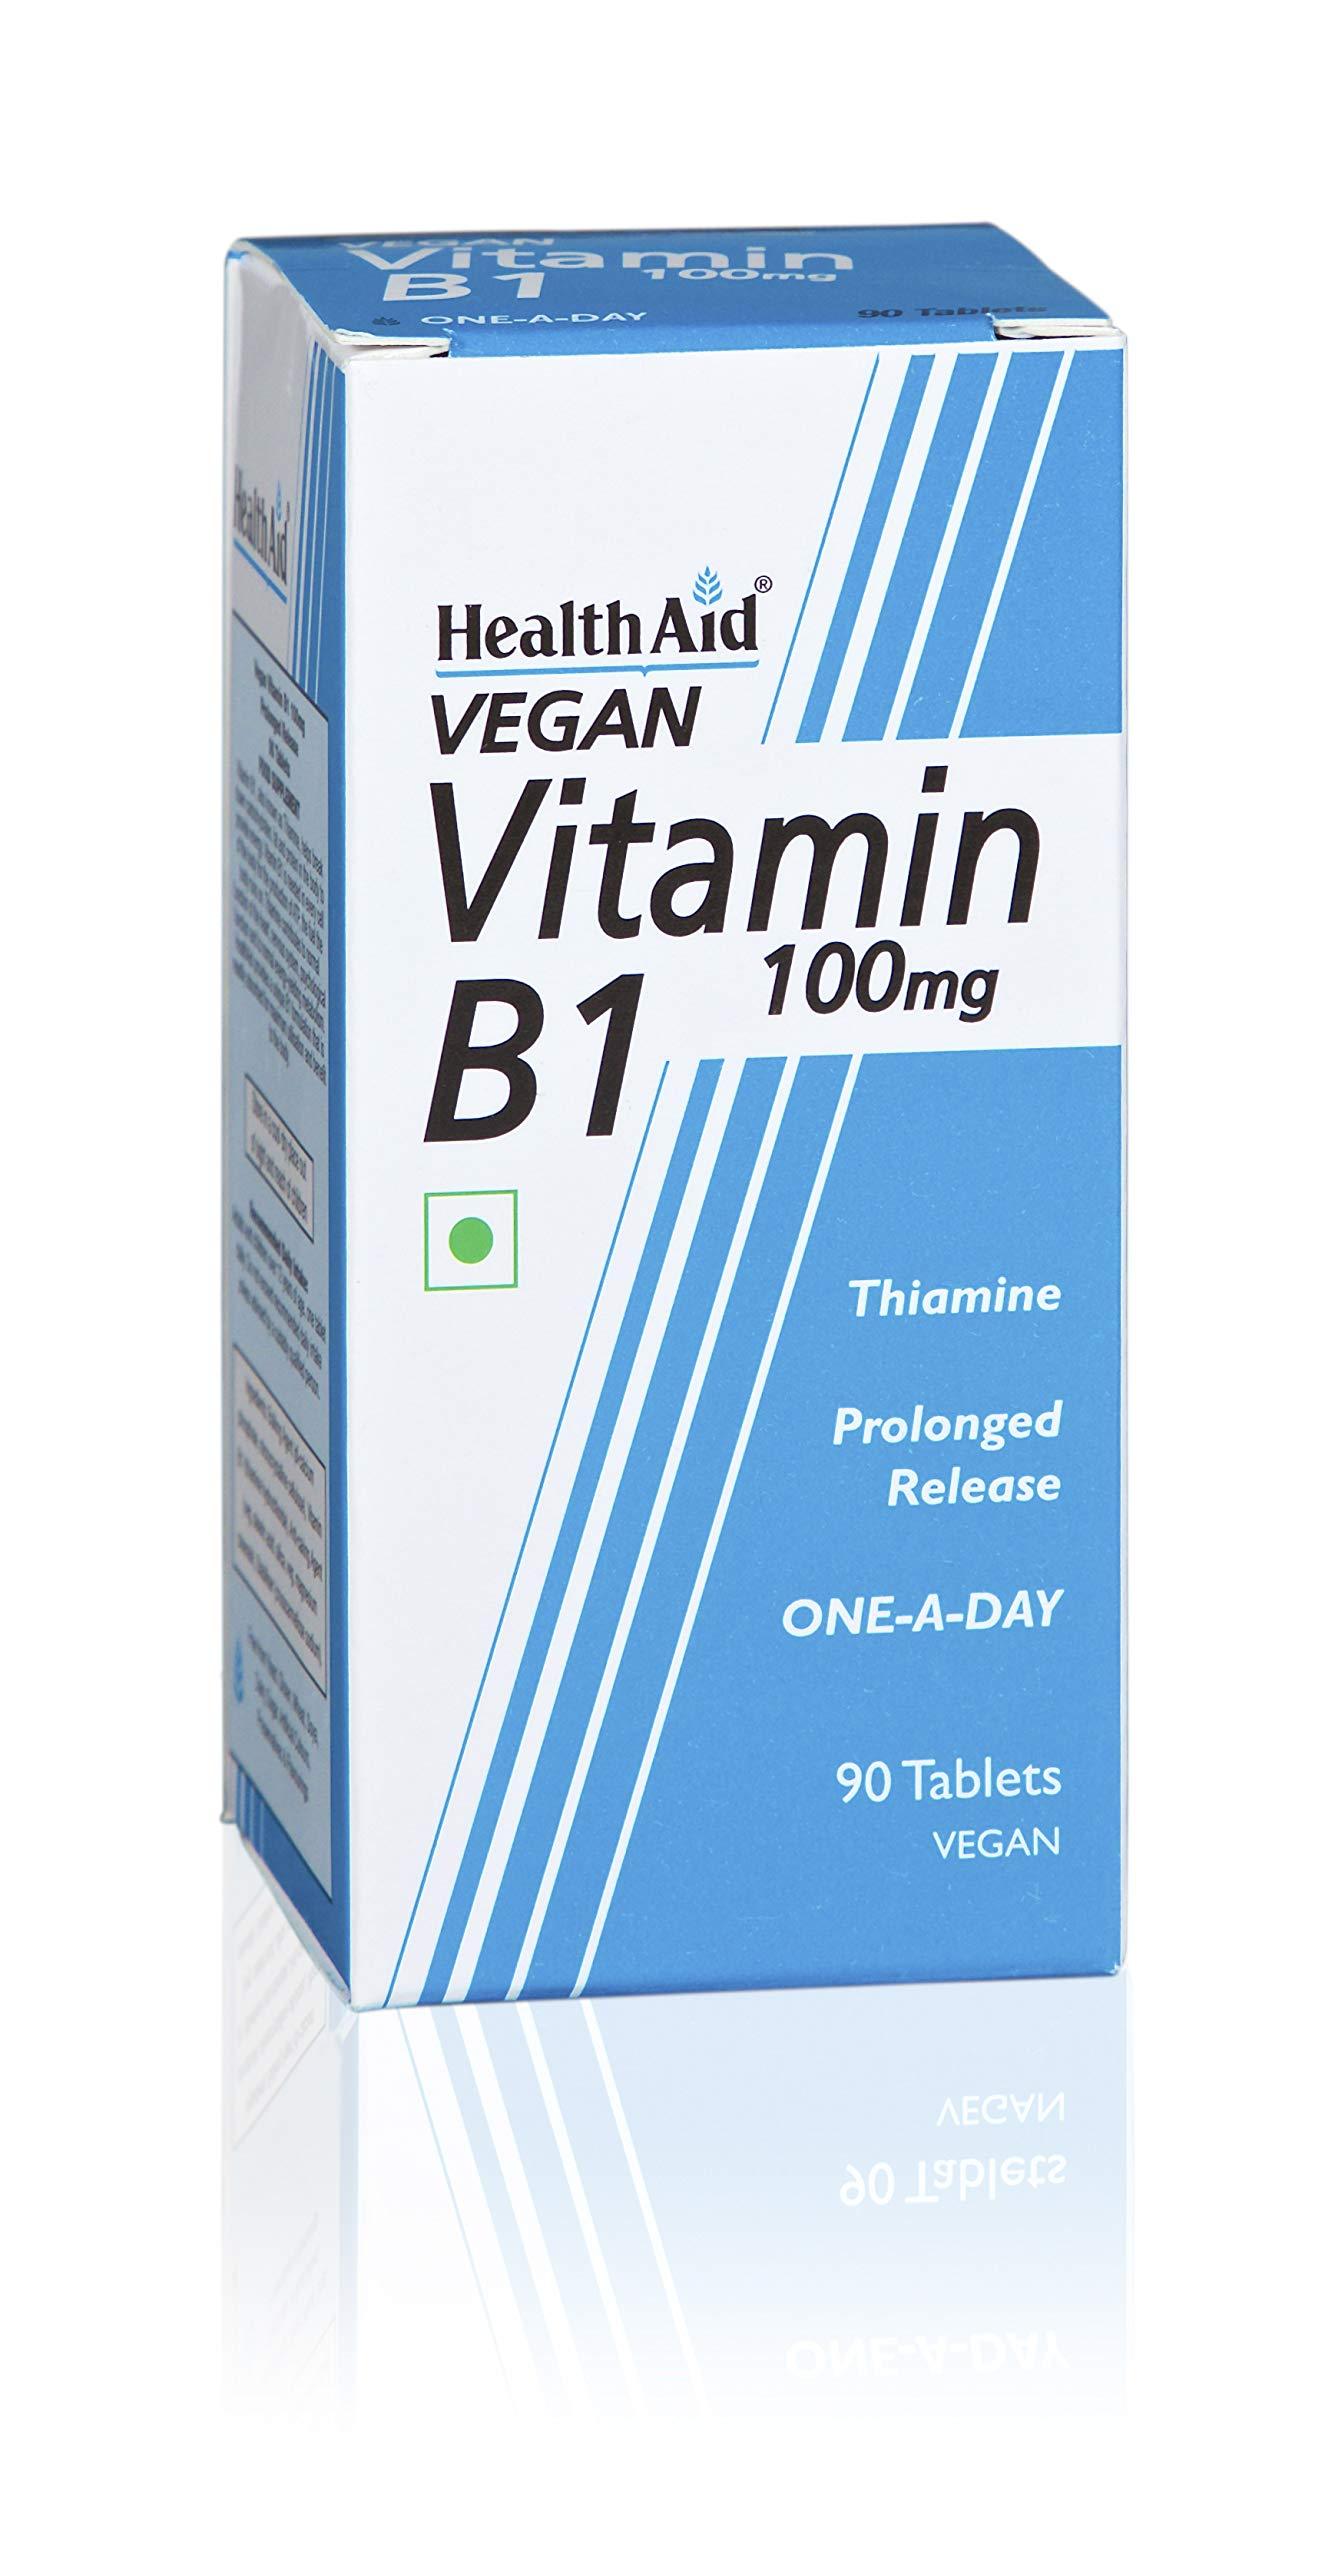 Health Aid Vitamin B1 (Thiamin) 100mg - Prolonged Release 90 Tablets